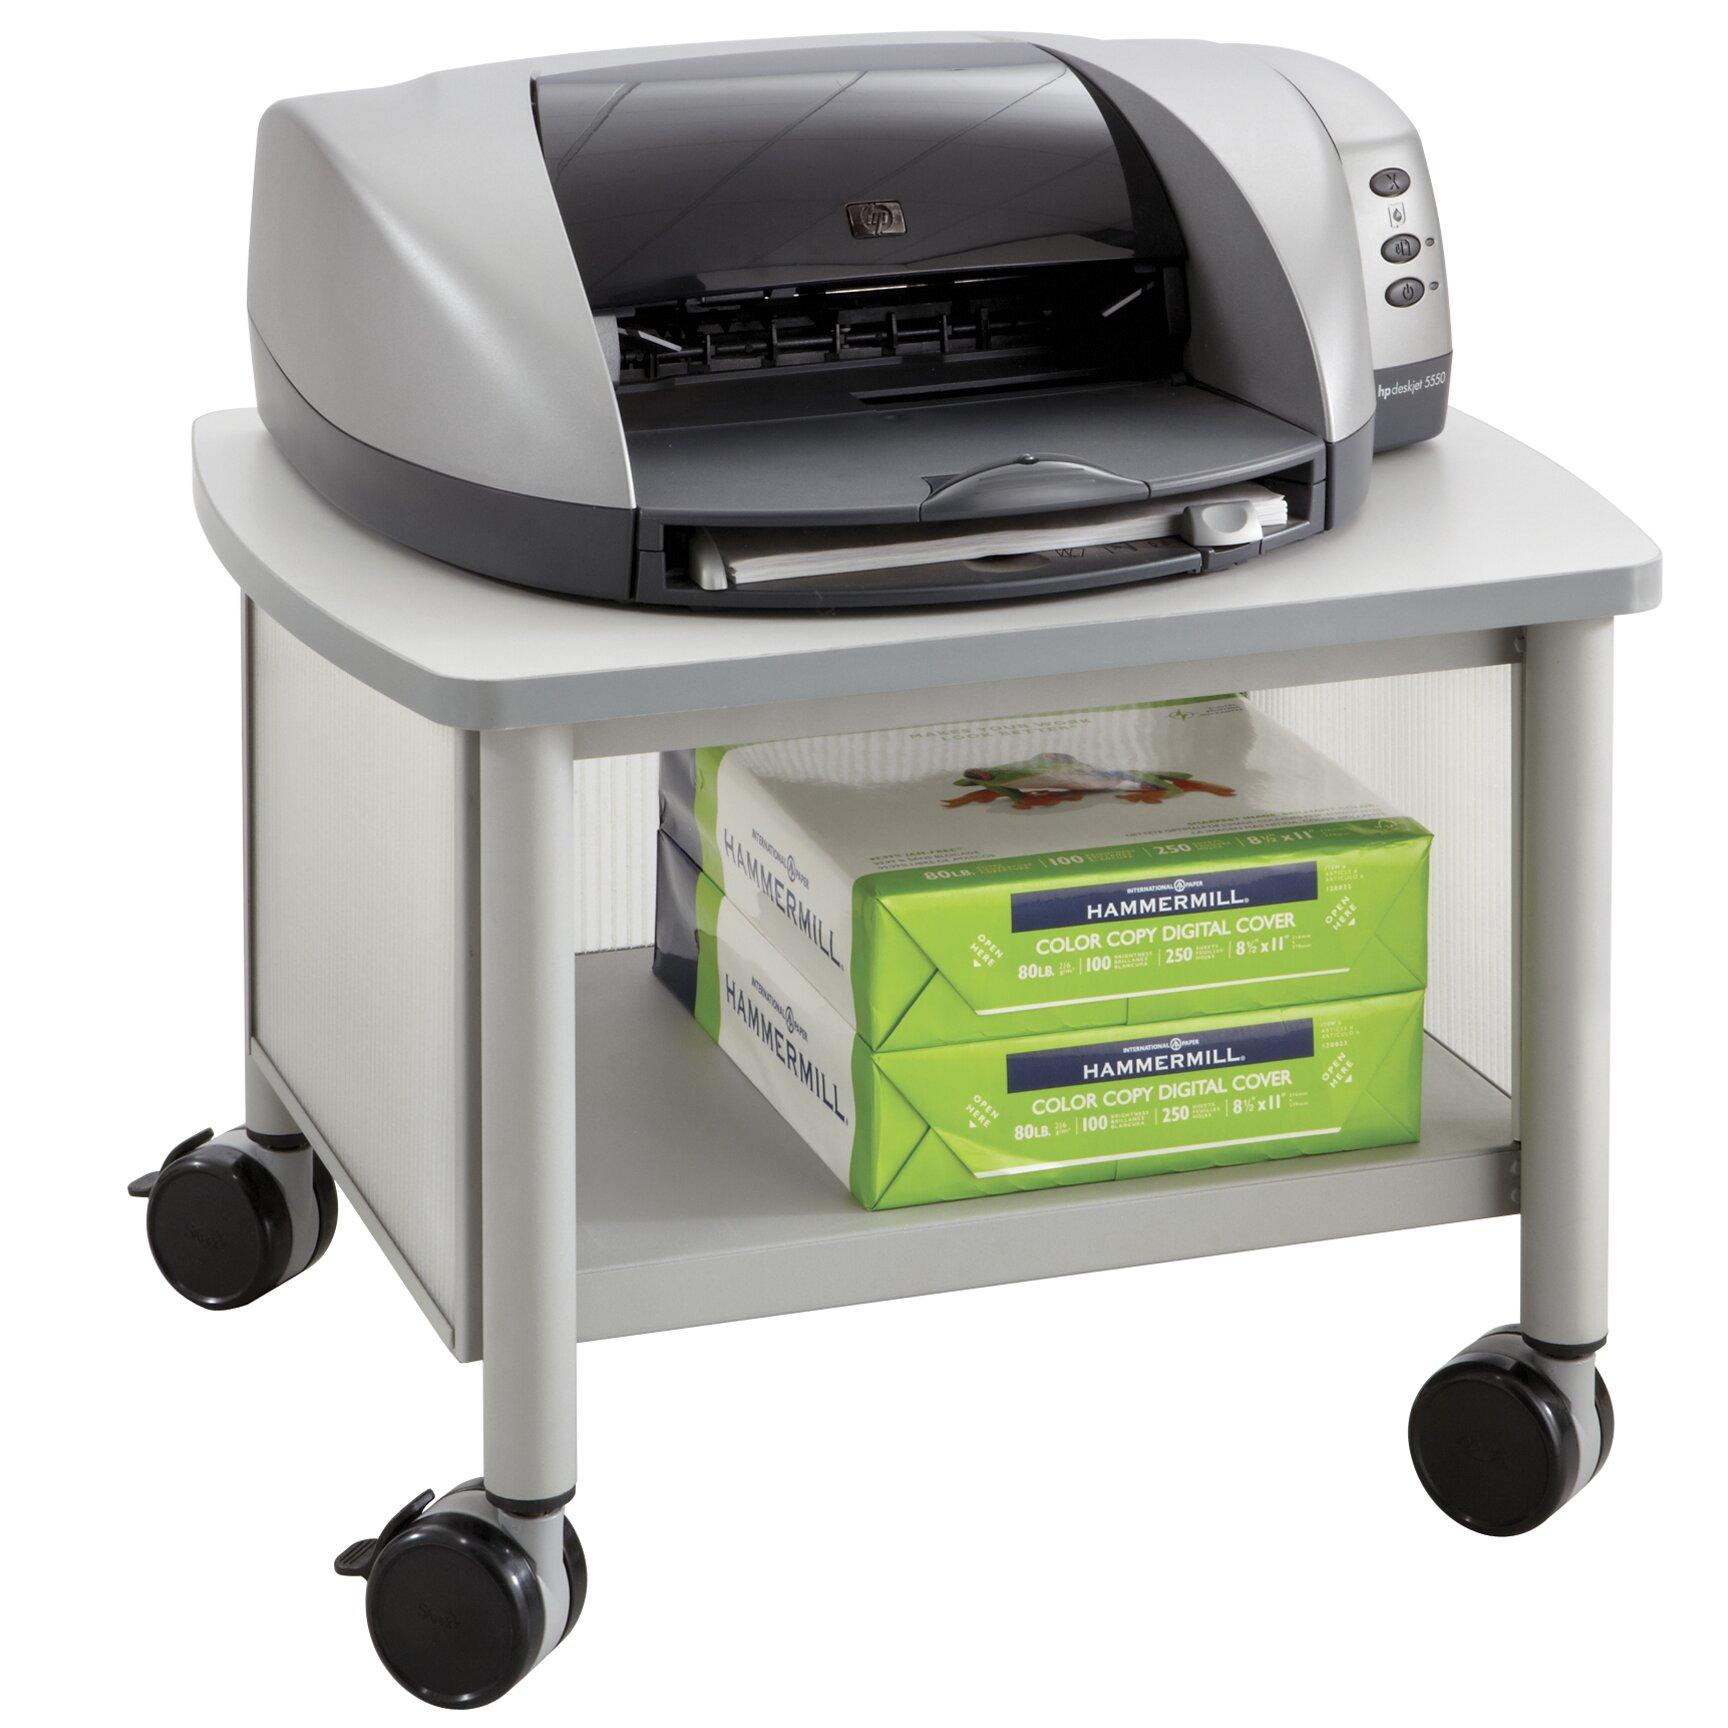 Safco Impromptu Mobile Printer Stand & Reviews   Wayfair UK